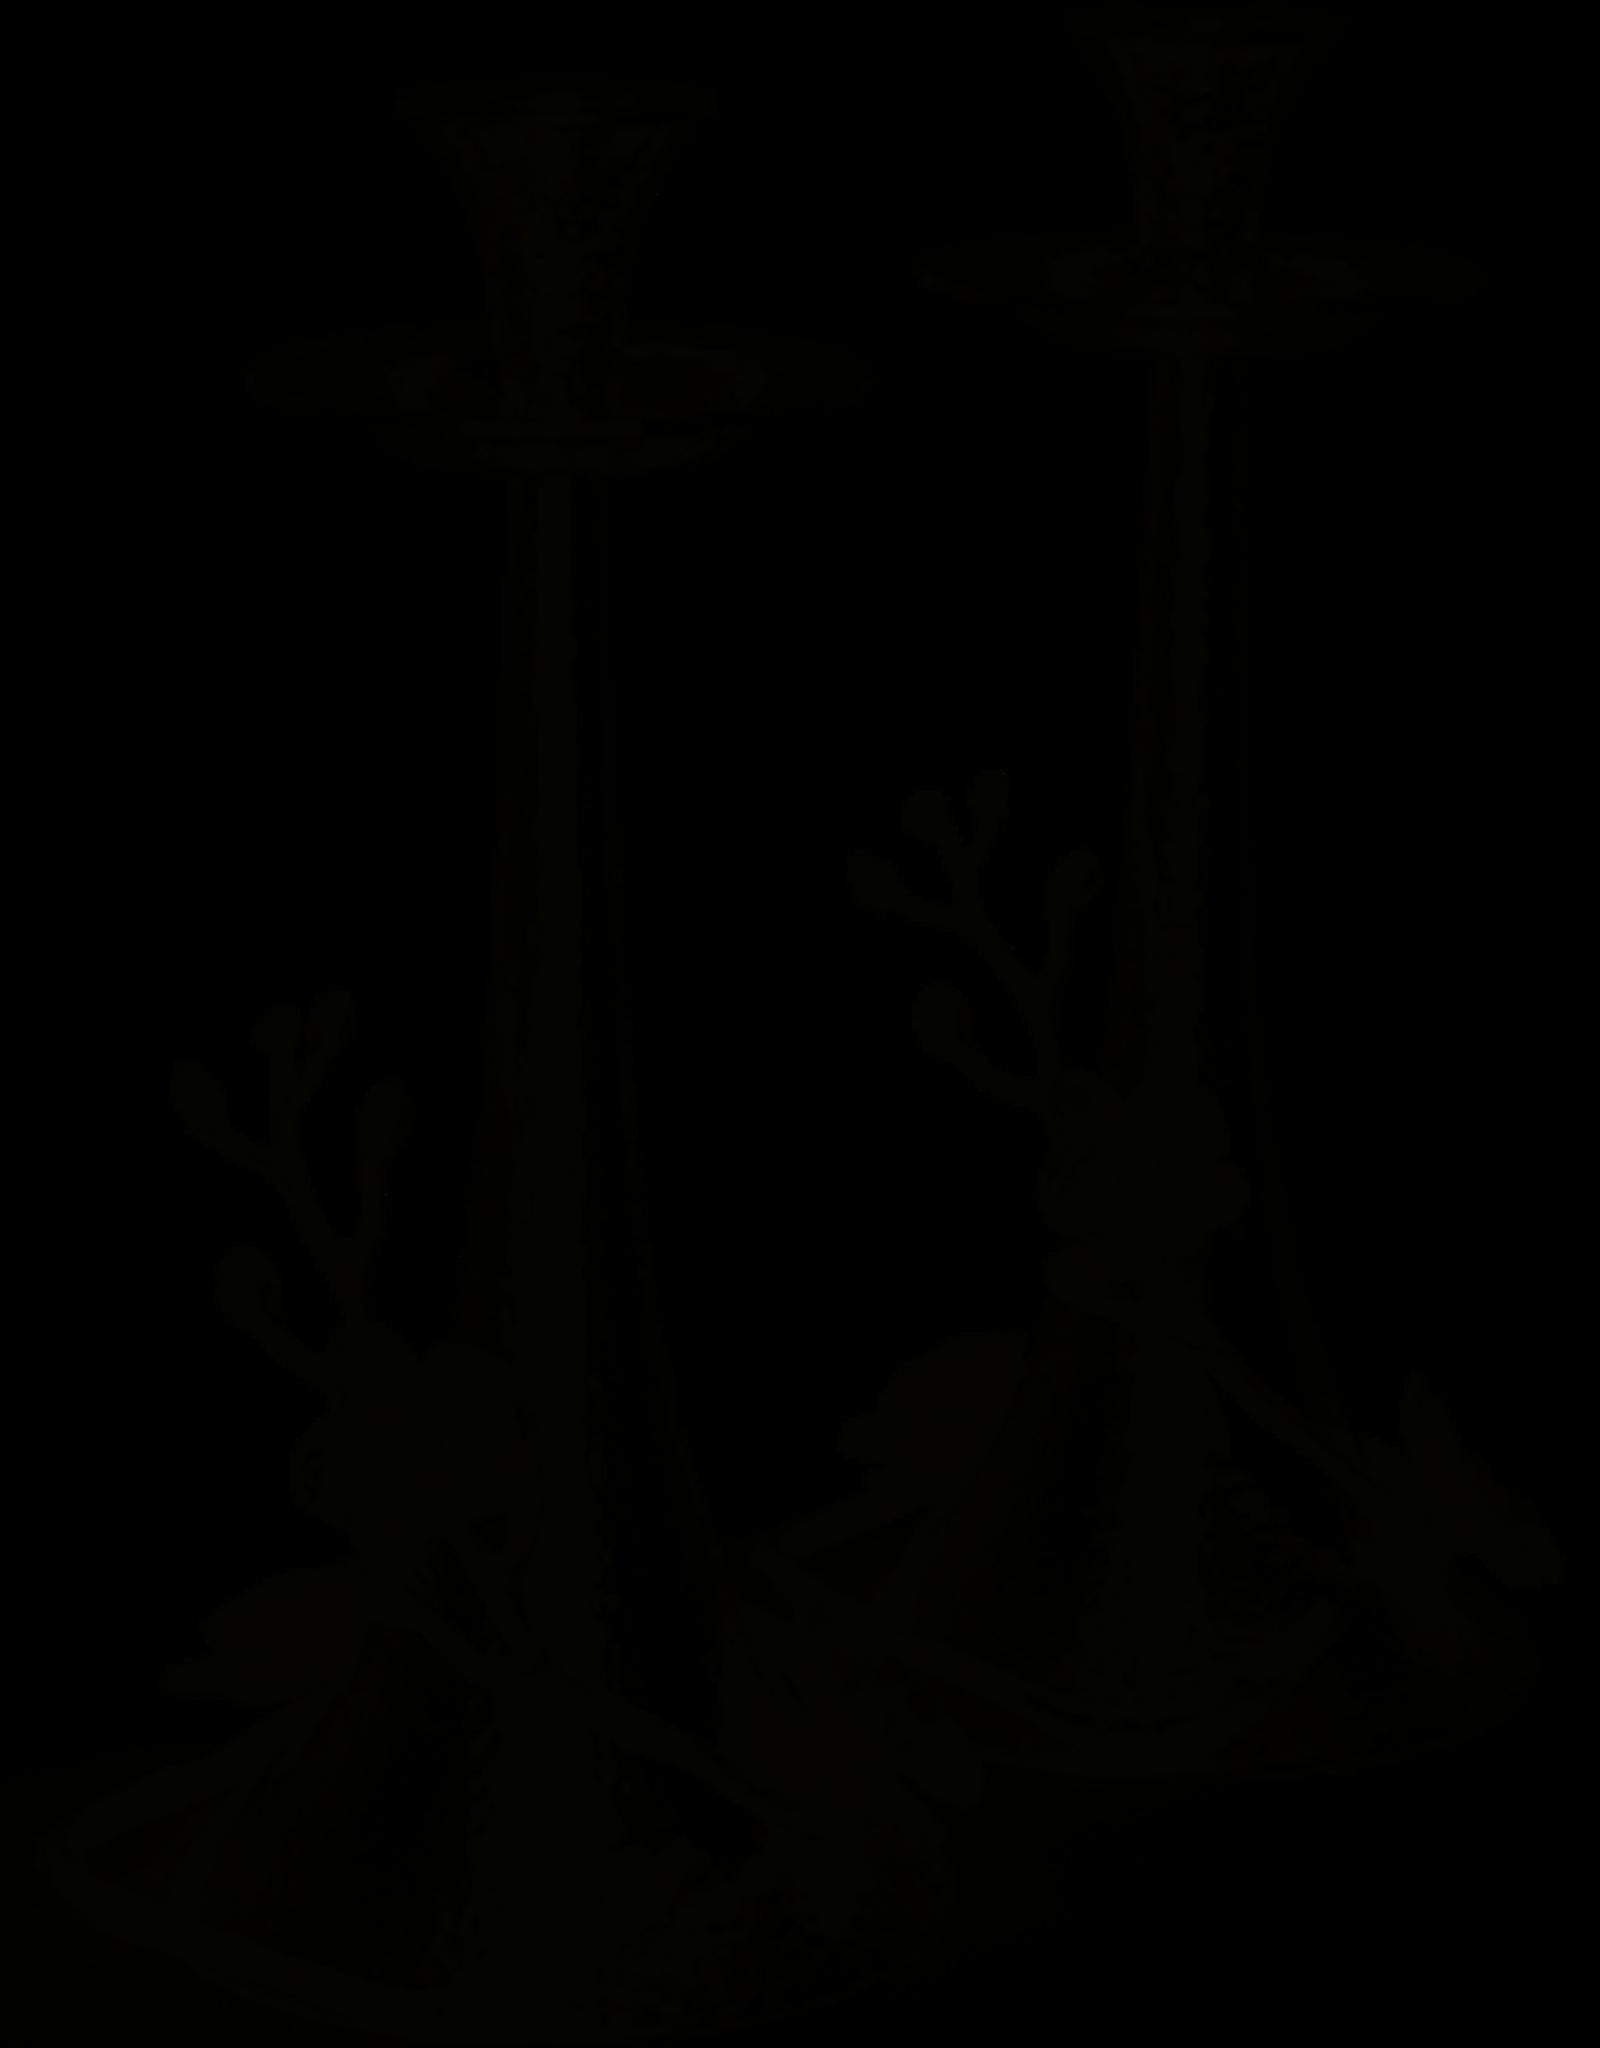 Candleholder, Black Orchid pair, Michael Aram